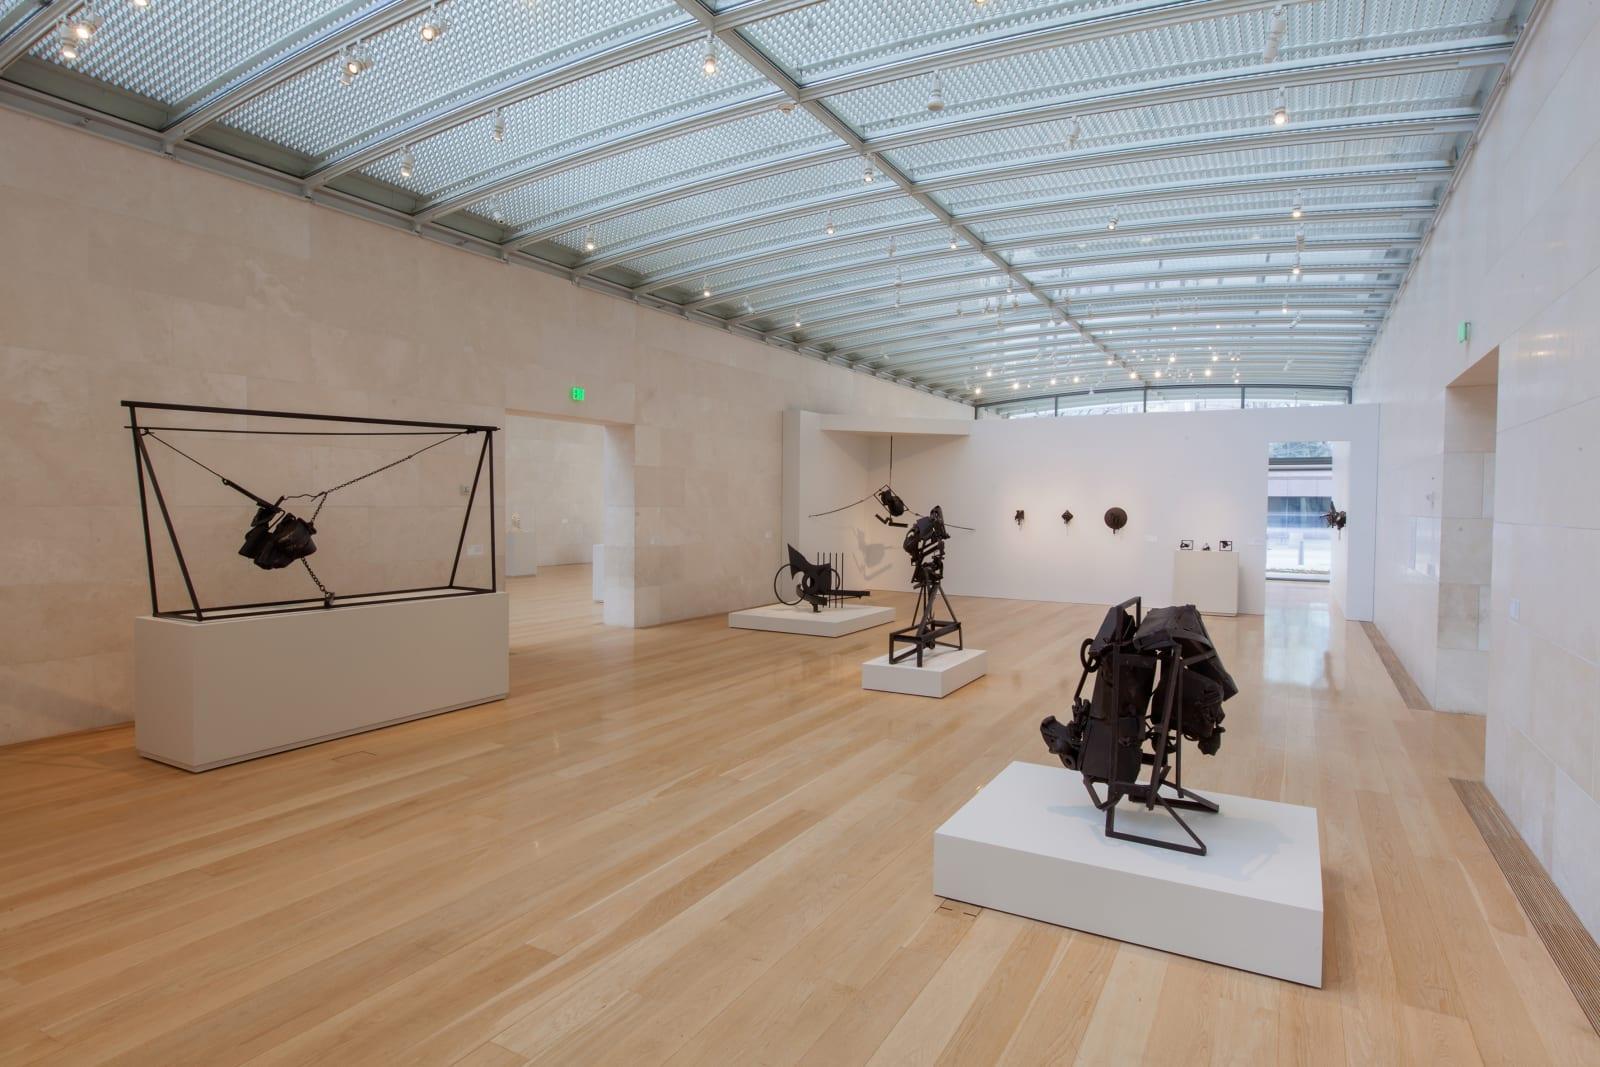 <p>Installation view:'Melvin Edwards: Five Decades', Nasher Sculpture Center, Dallas, Texas (2015)</p>